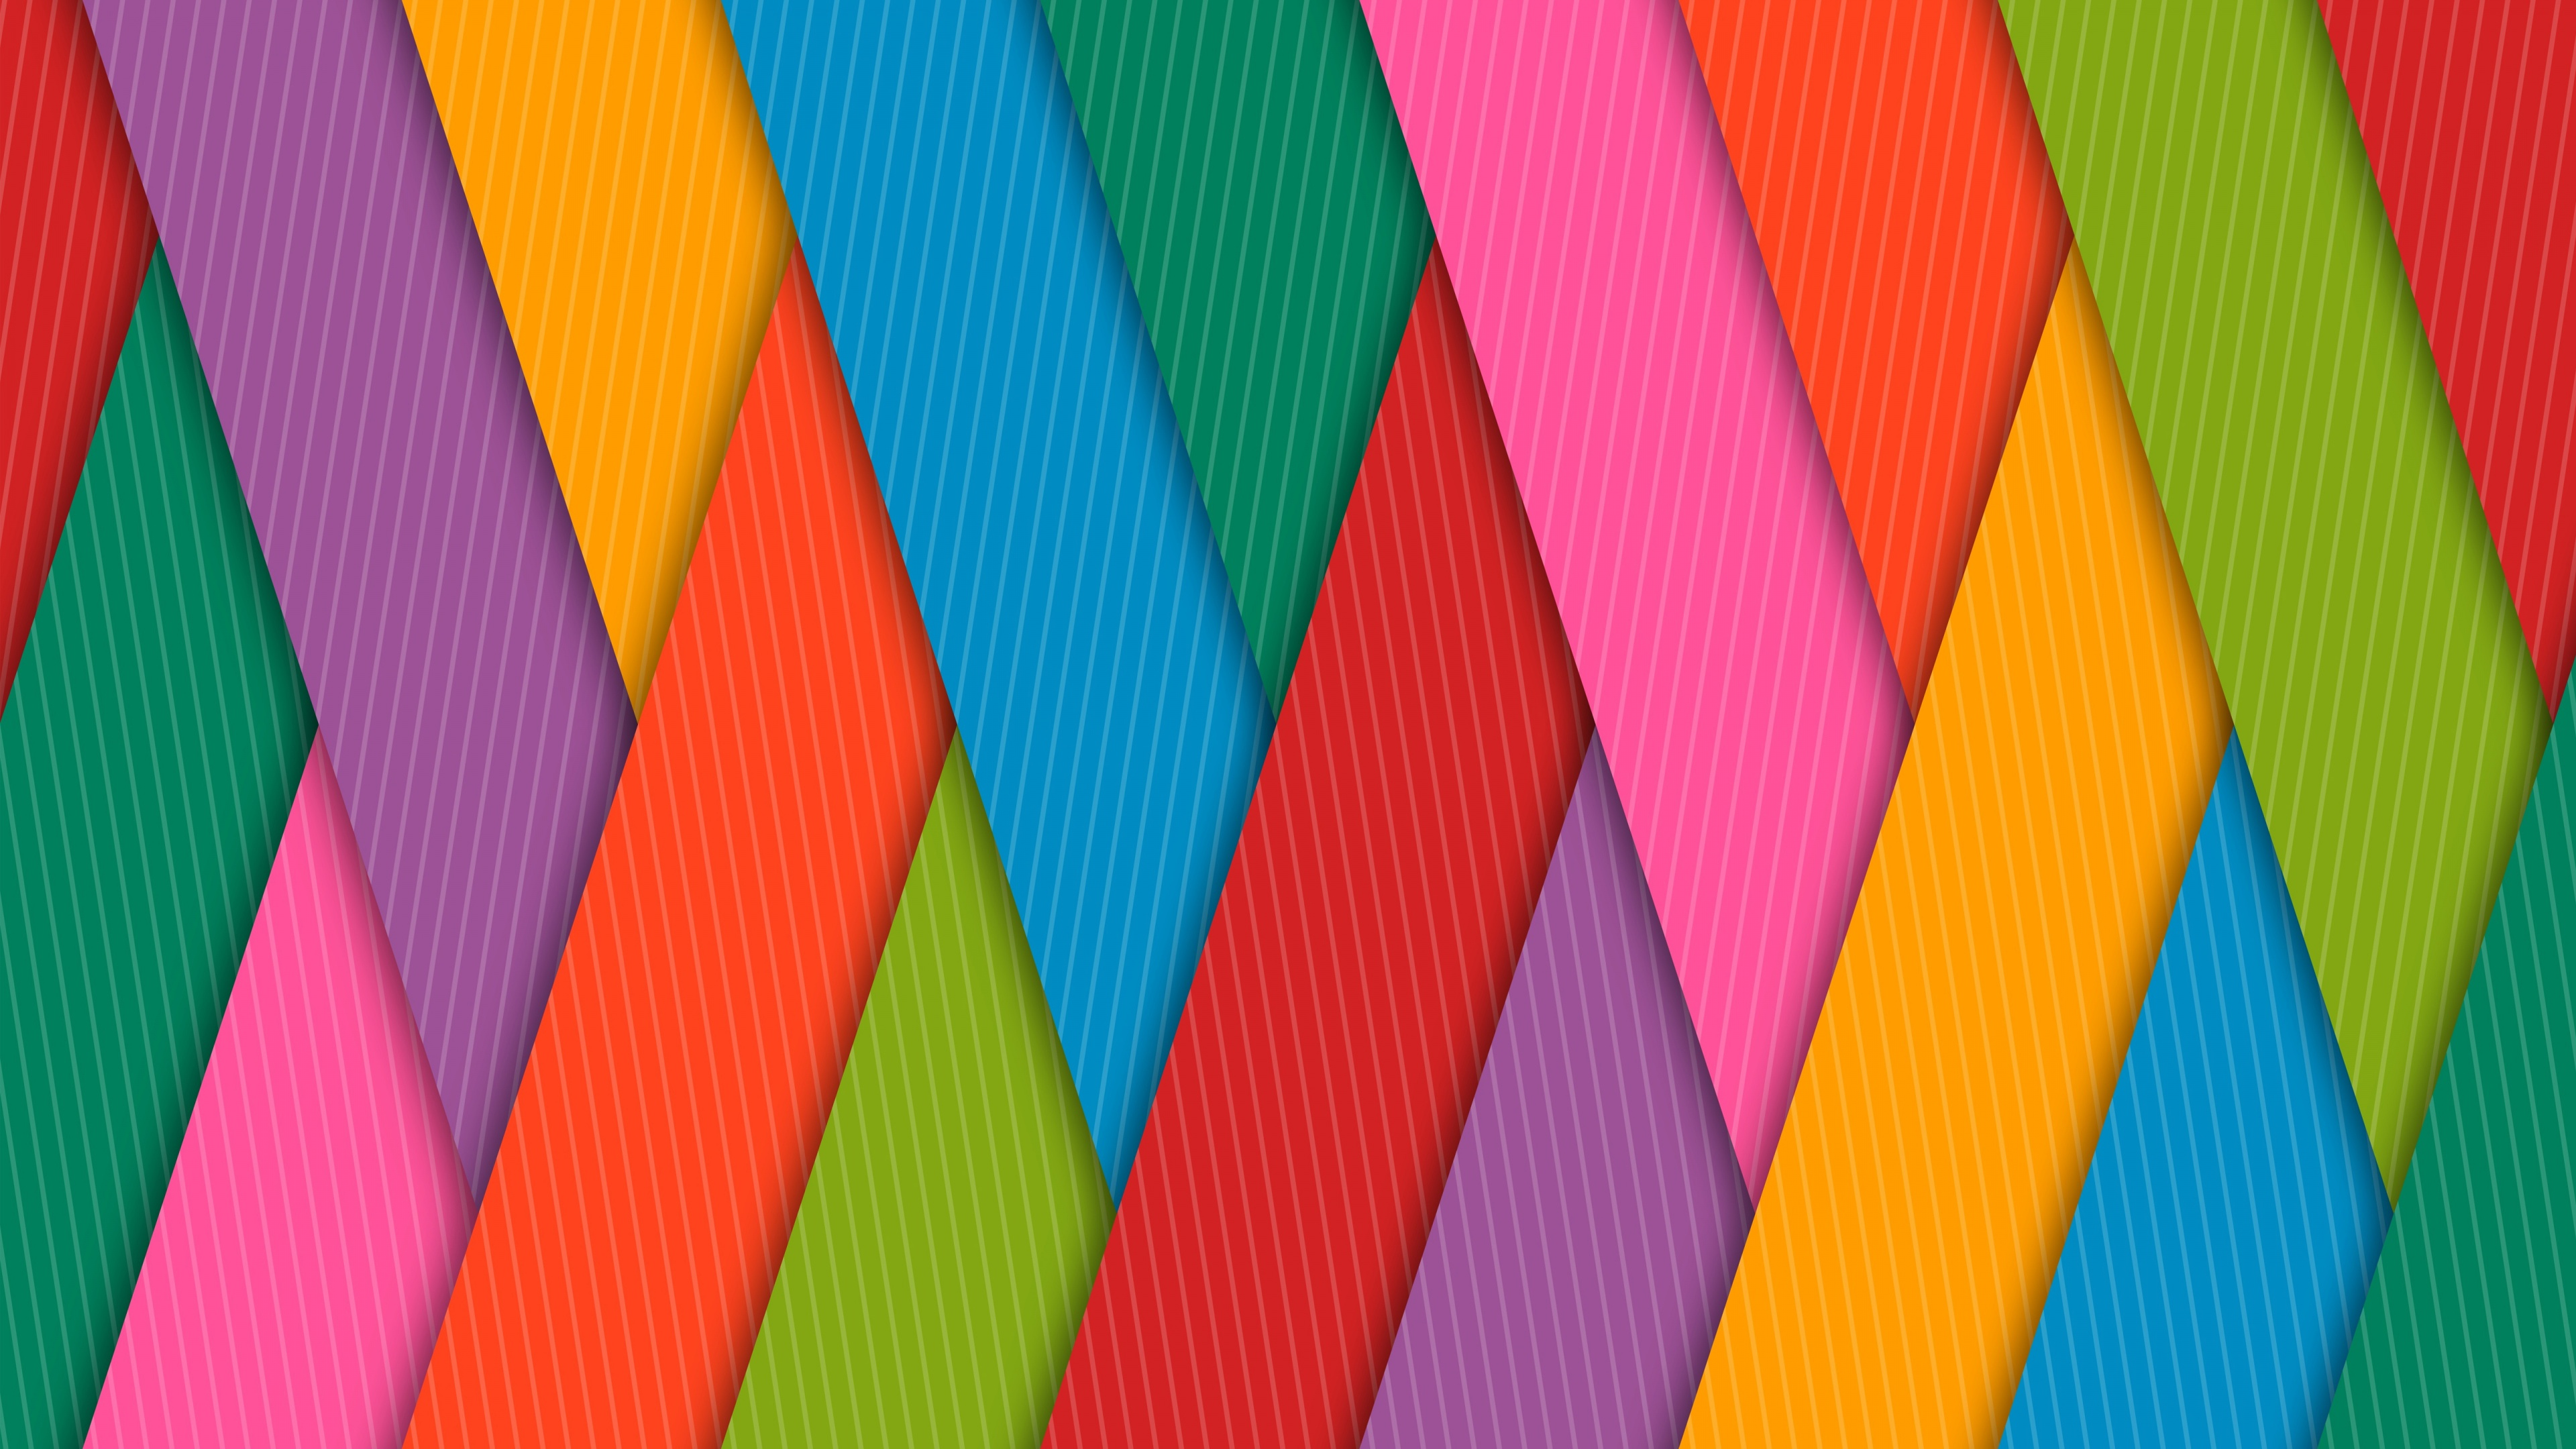 3d Wallpaper Star Wars Colorful Strips 4k 5k Wallpapers In Jpg Format For Free